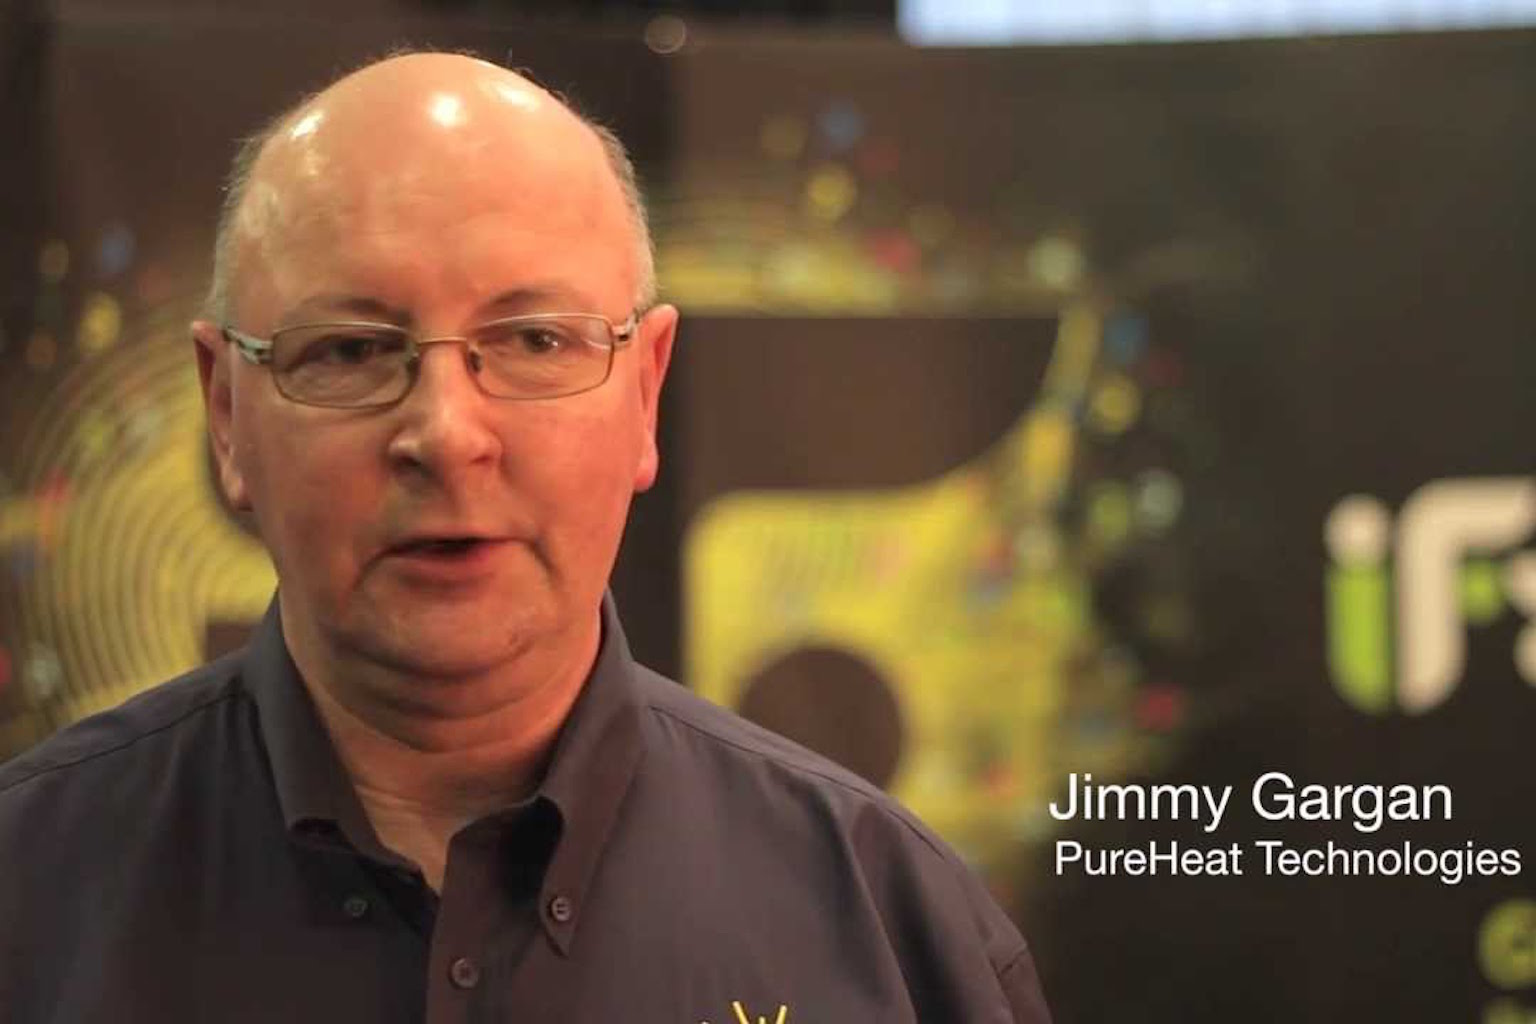 Jimmy Gargan of Pureheat Technologies